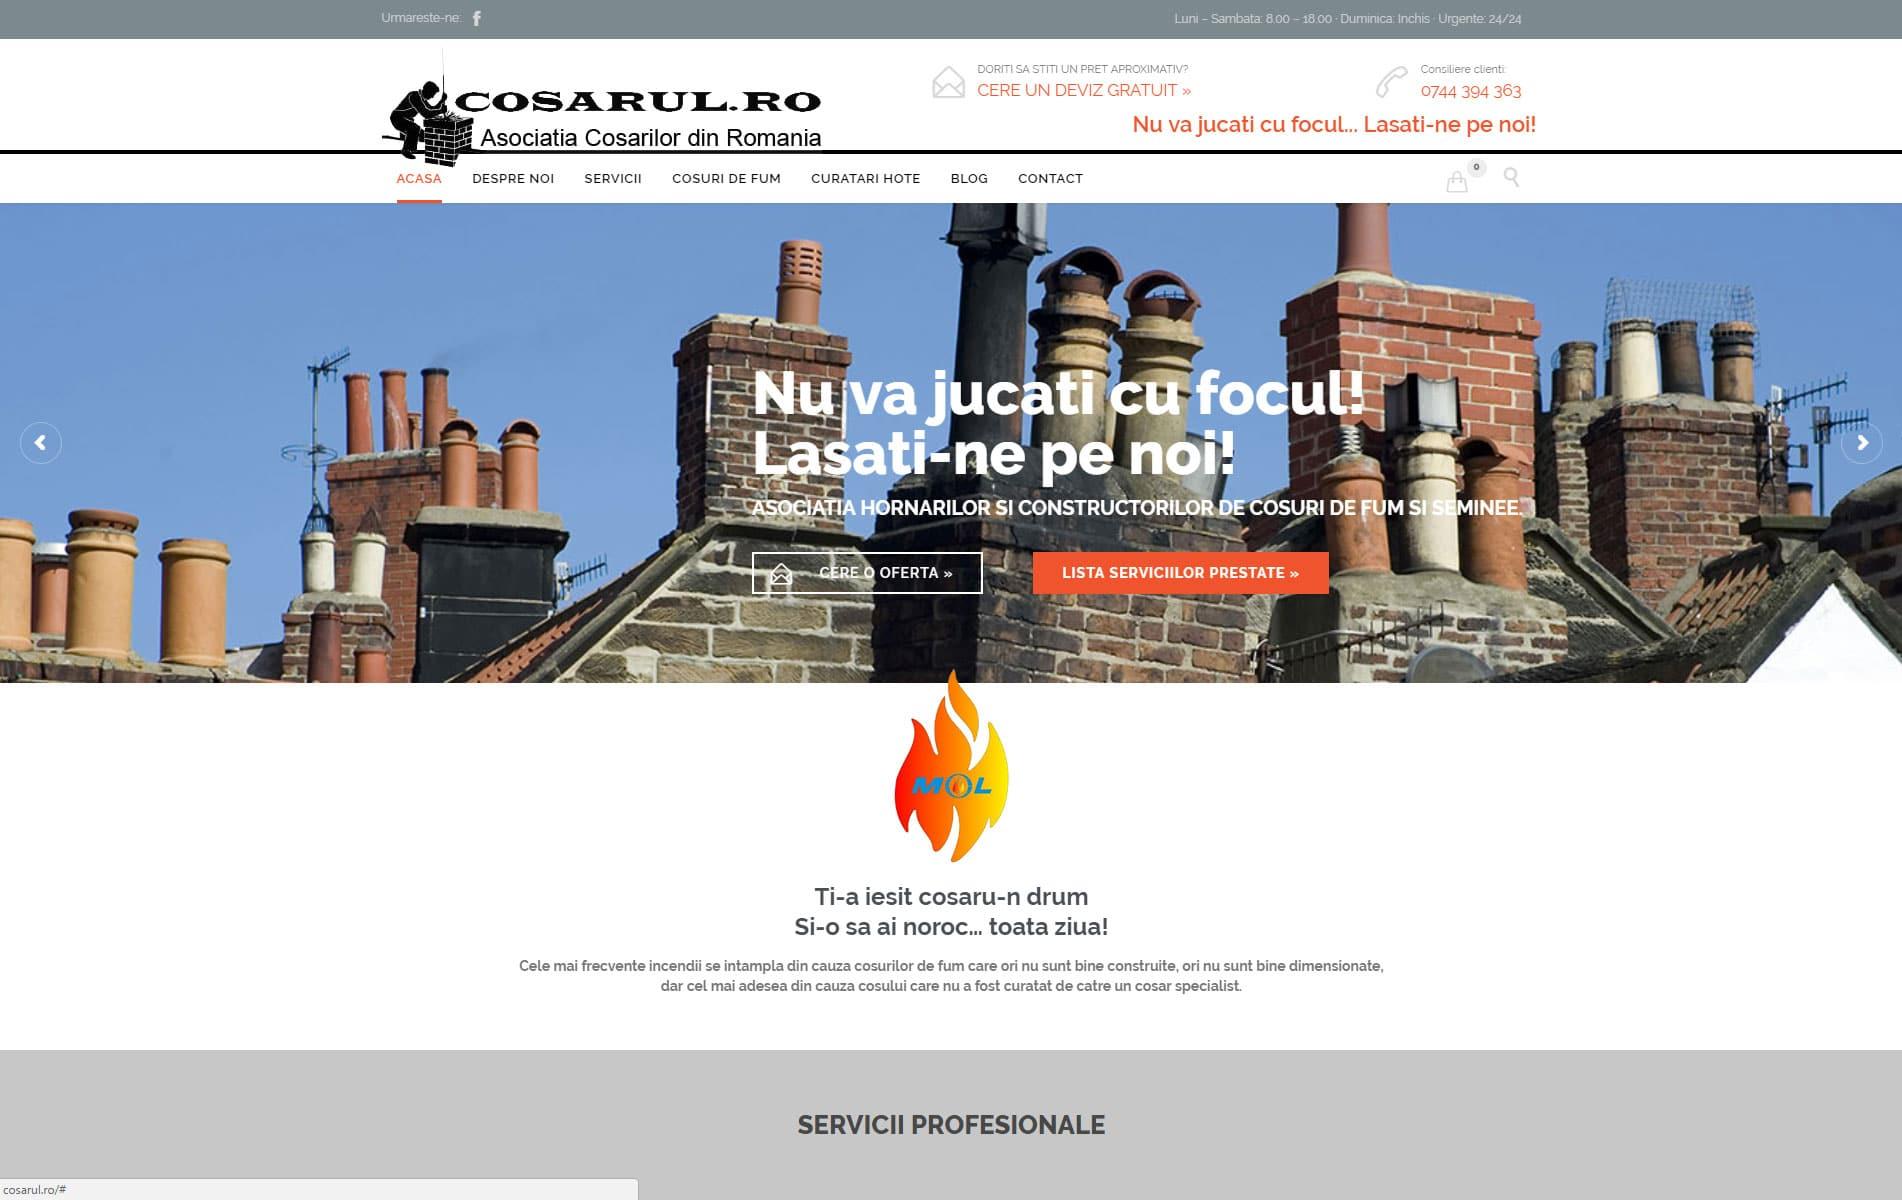 Cosar - inspectii cosuri de fum, curatari cosuri de fum, curatari seminee, centrale sobe si cuptoare